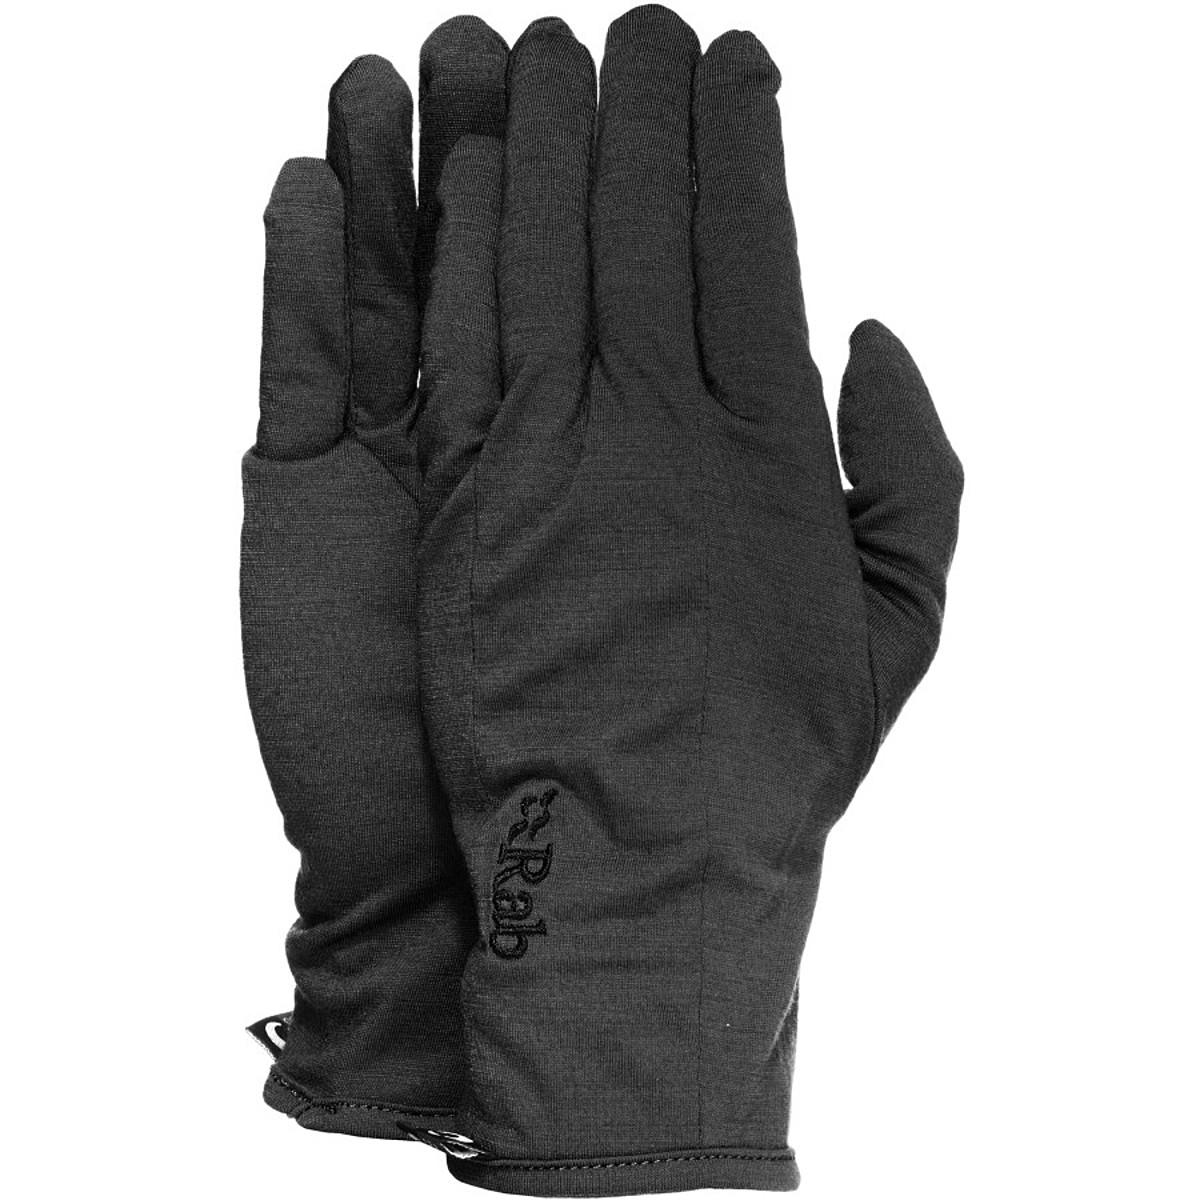 Rab MeCo 165 Glove